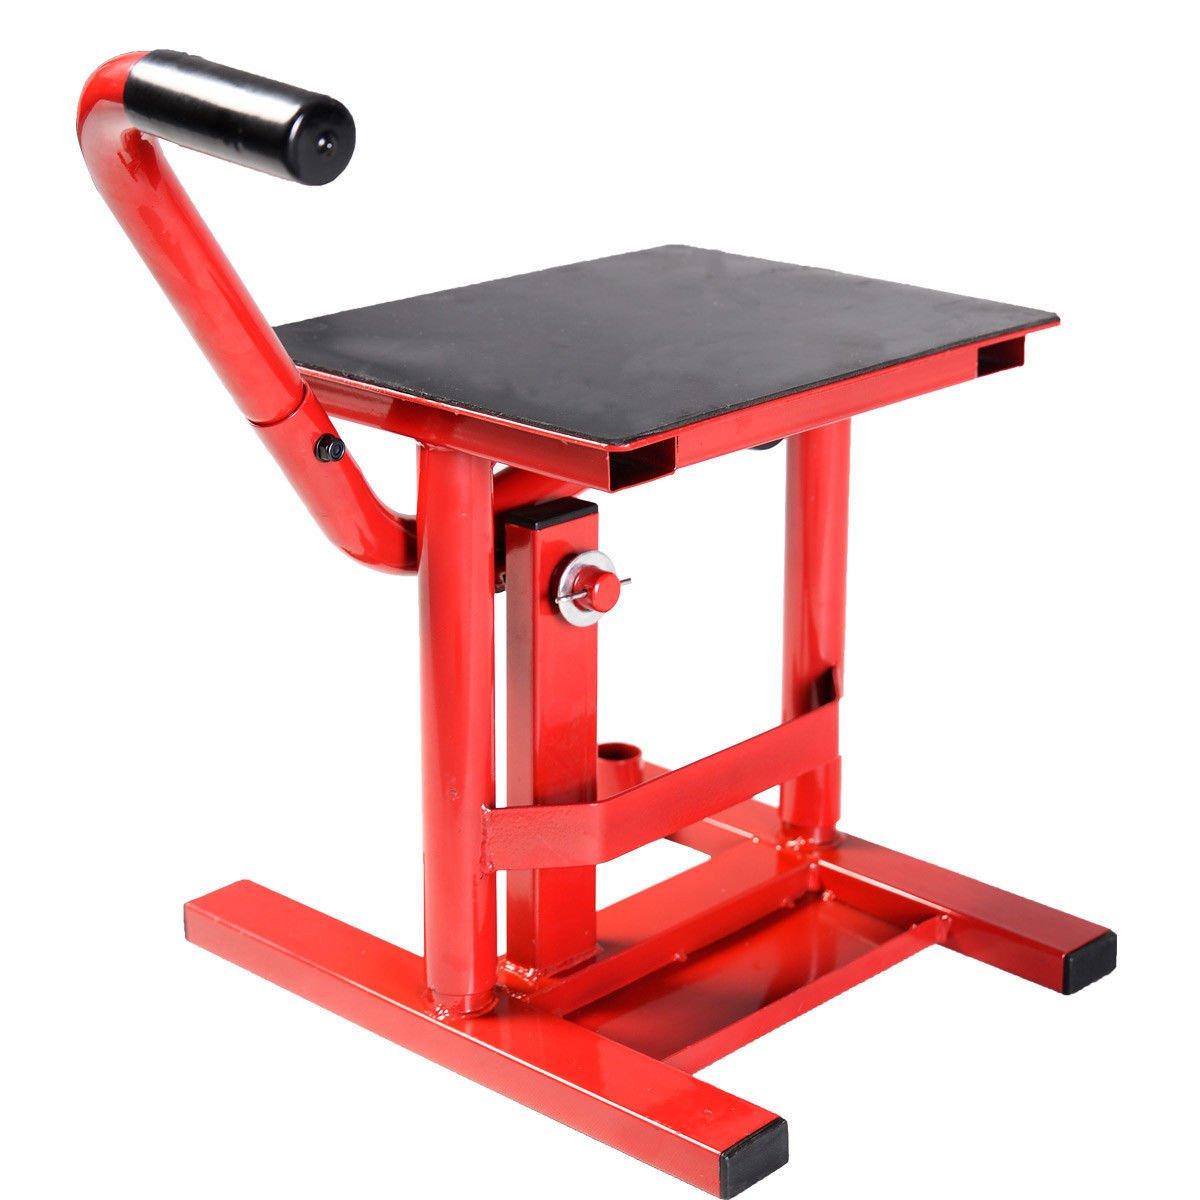 Motorcycle Racing Offroad Motocross Dirt Adjustable Bike Steel Lift Jack Stand (Red)